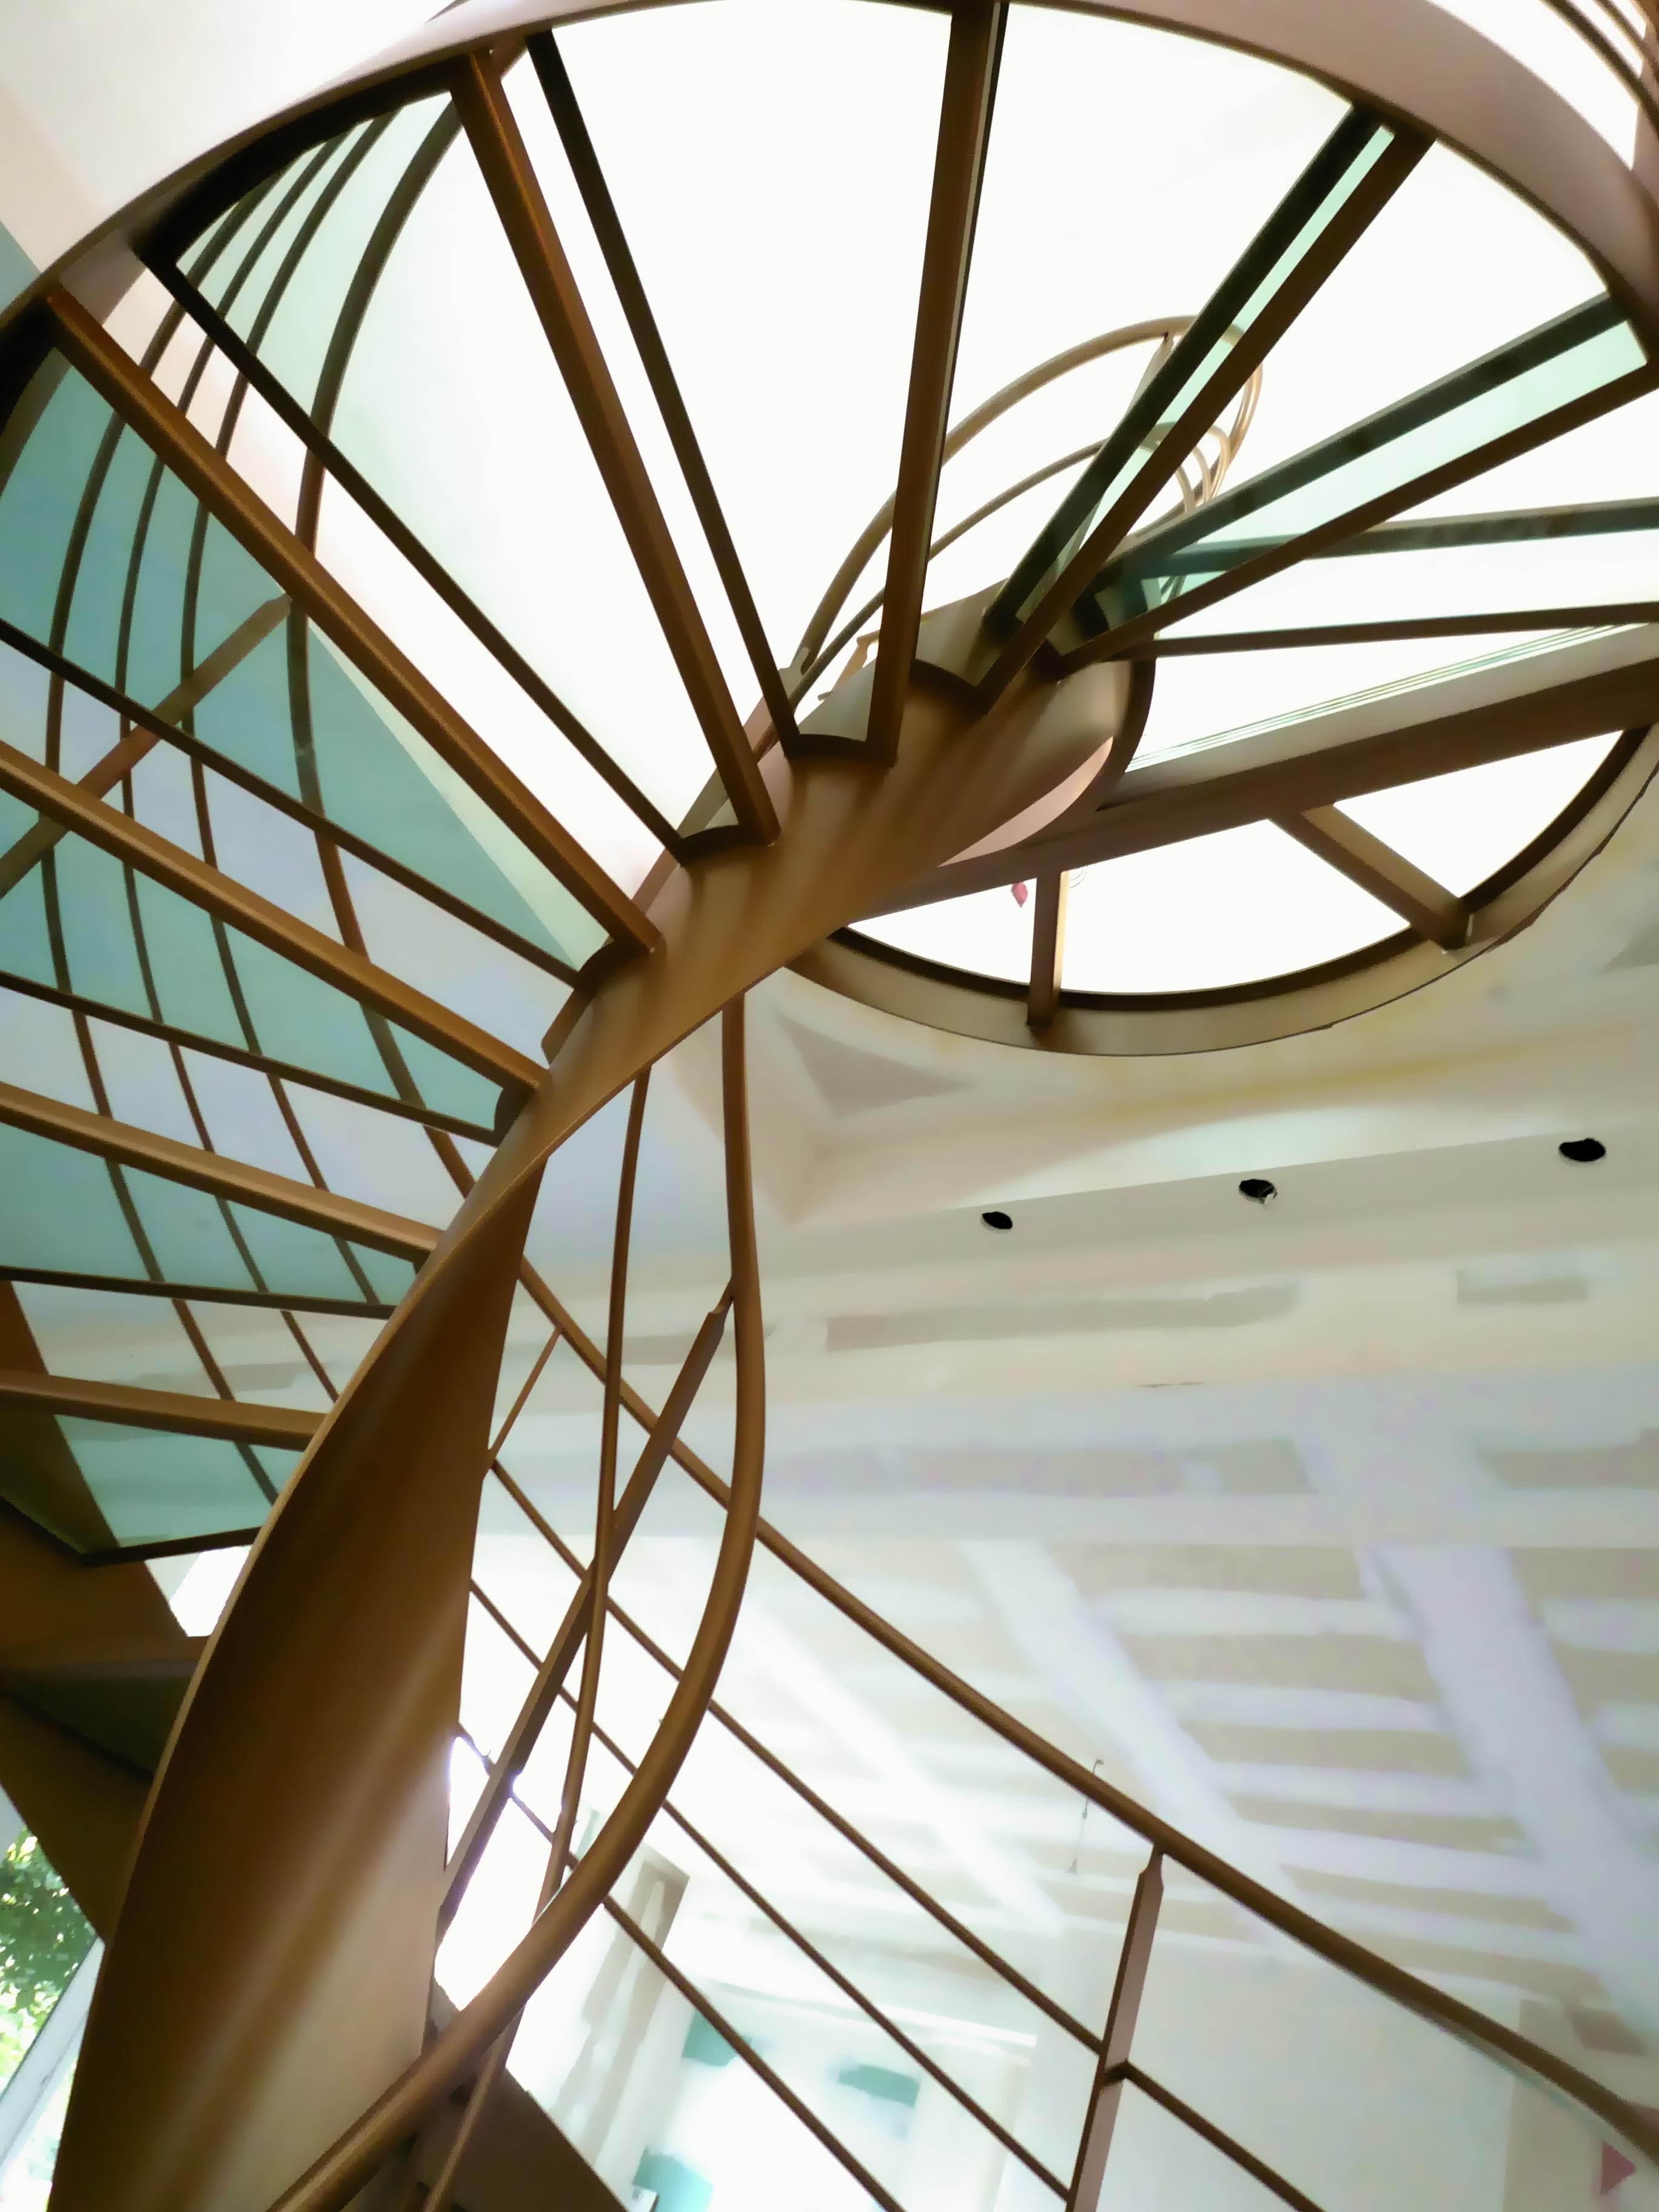 Mobilier contemporain la stylique - Escalier helicoidal design ...